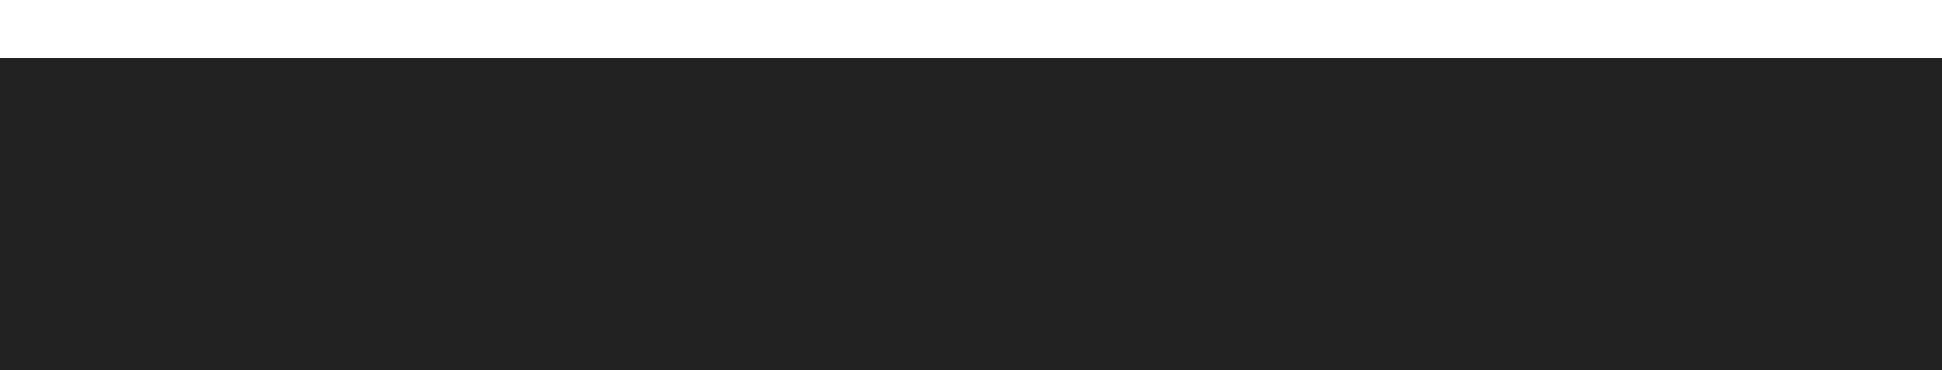 Teepublic - Jukka Heilimo Shop